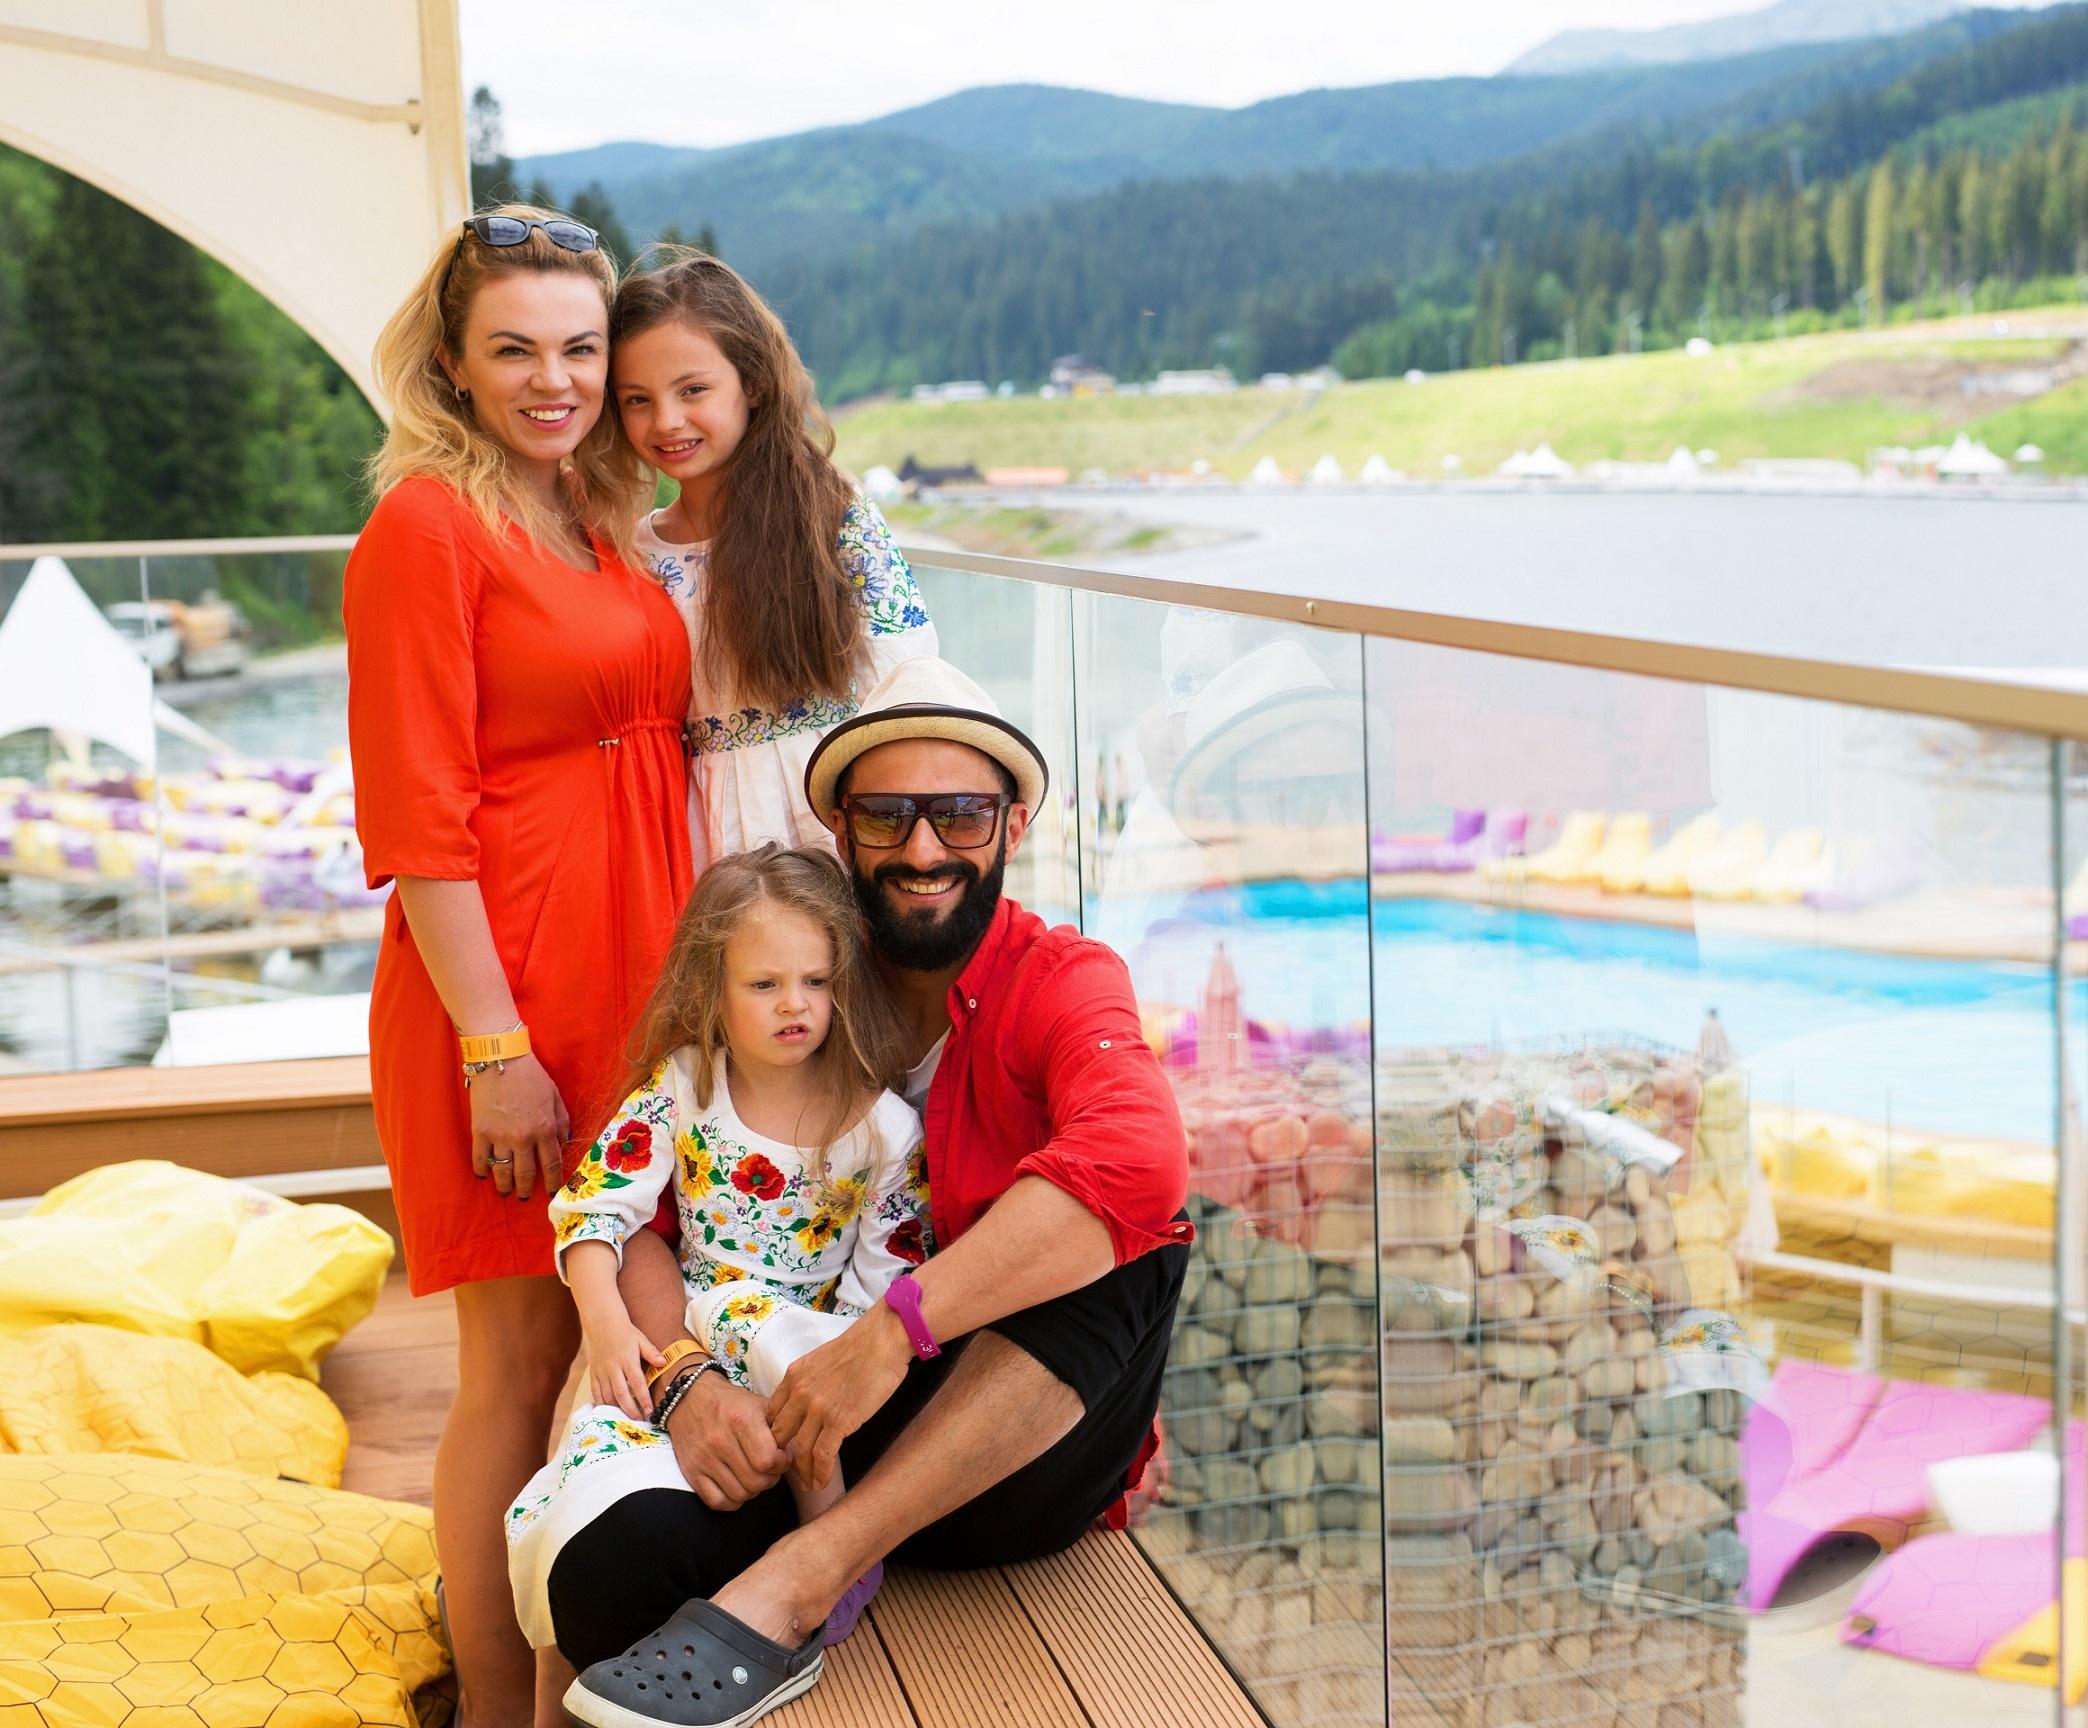 Kishe отдохнул с семьей в Буковеле